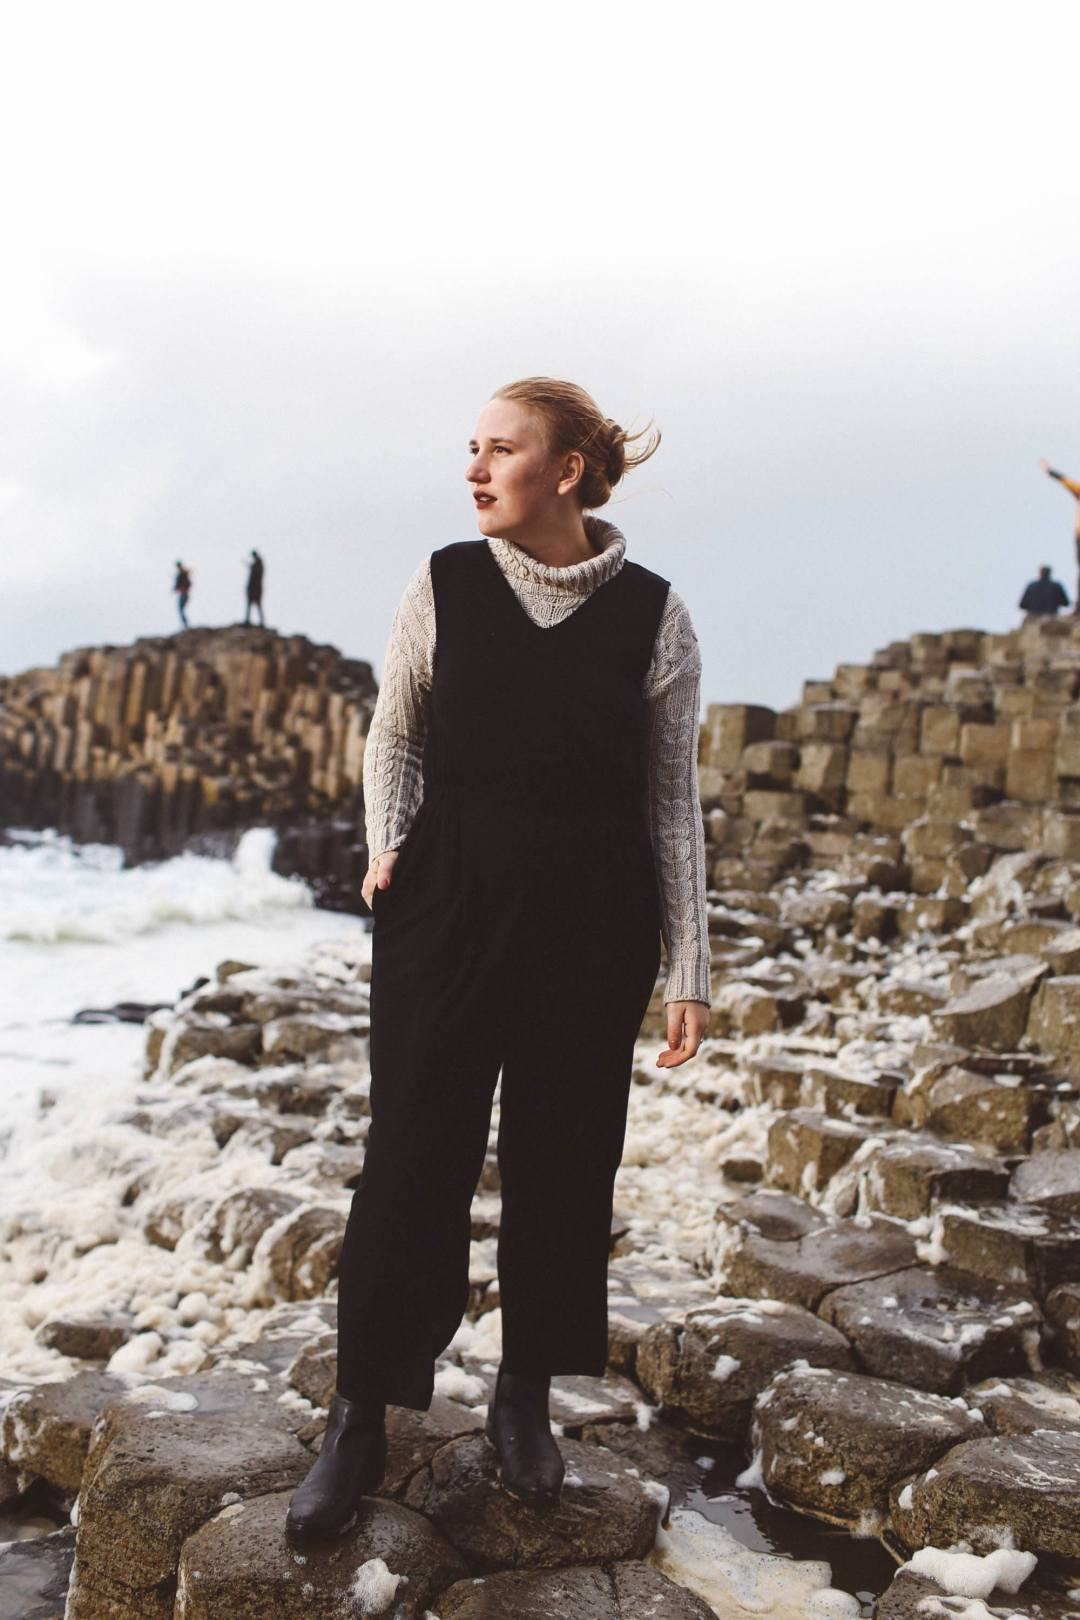 Giant's Causeway hours woman ireland